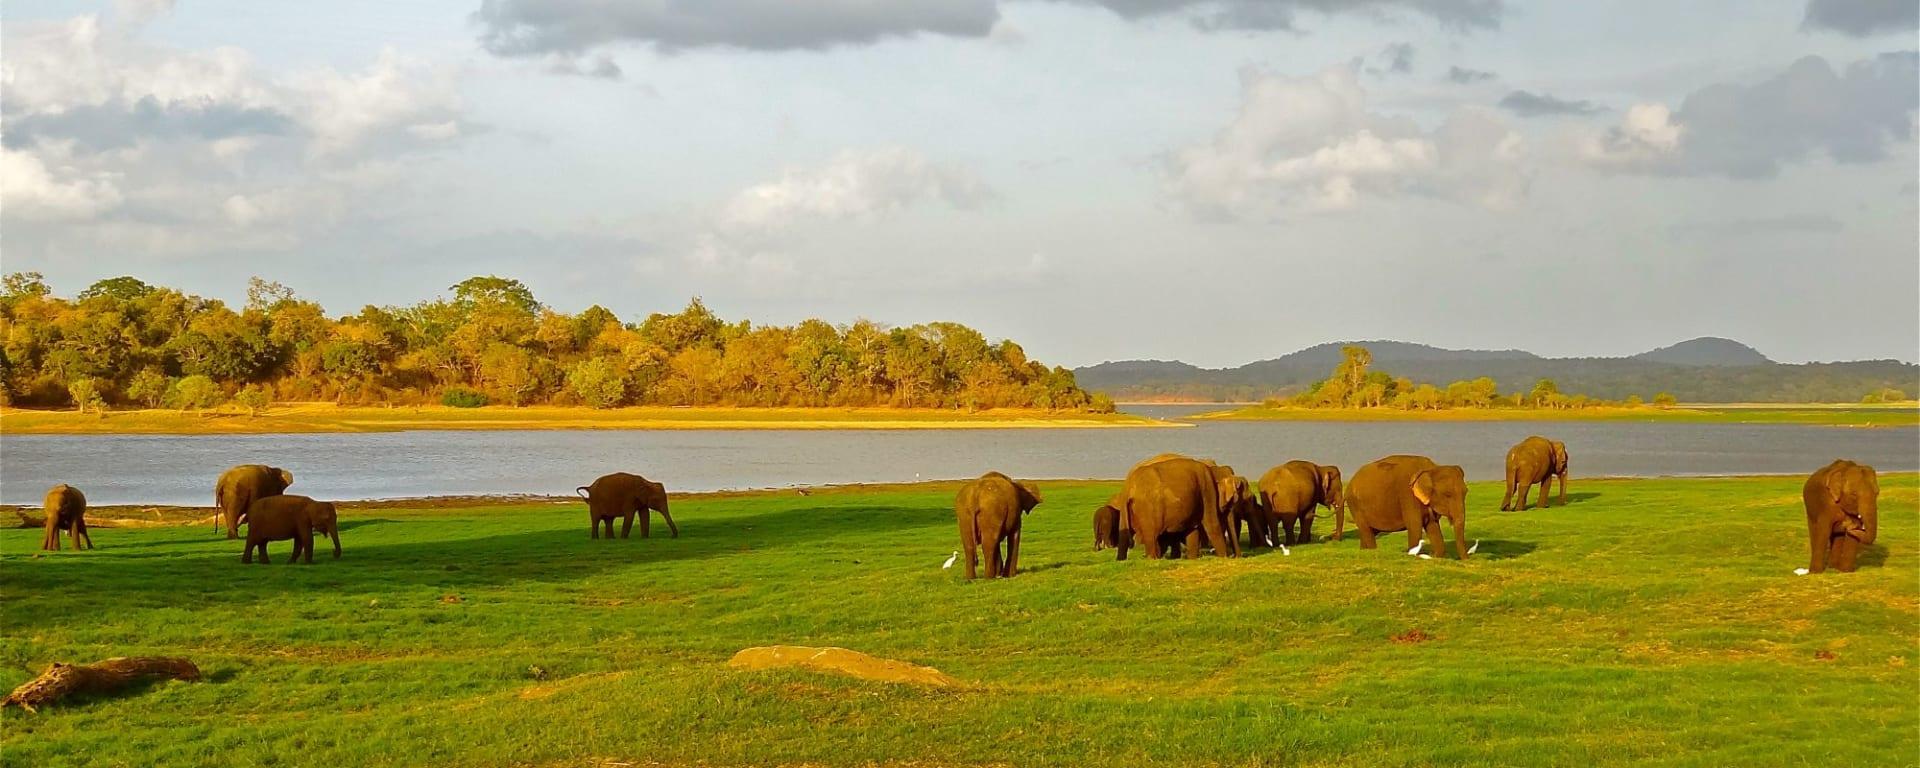 Les hauts lieux du Sri Lanka de Colombo: Minneriya National Park